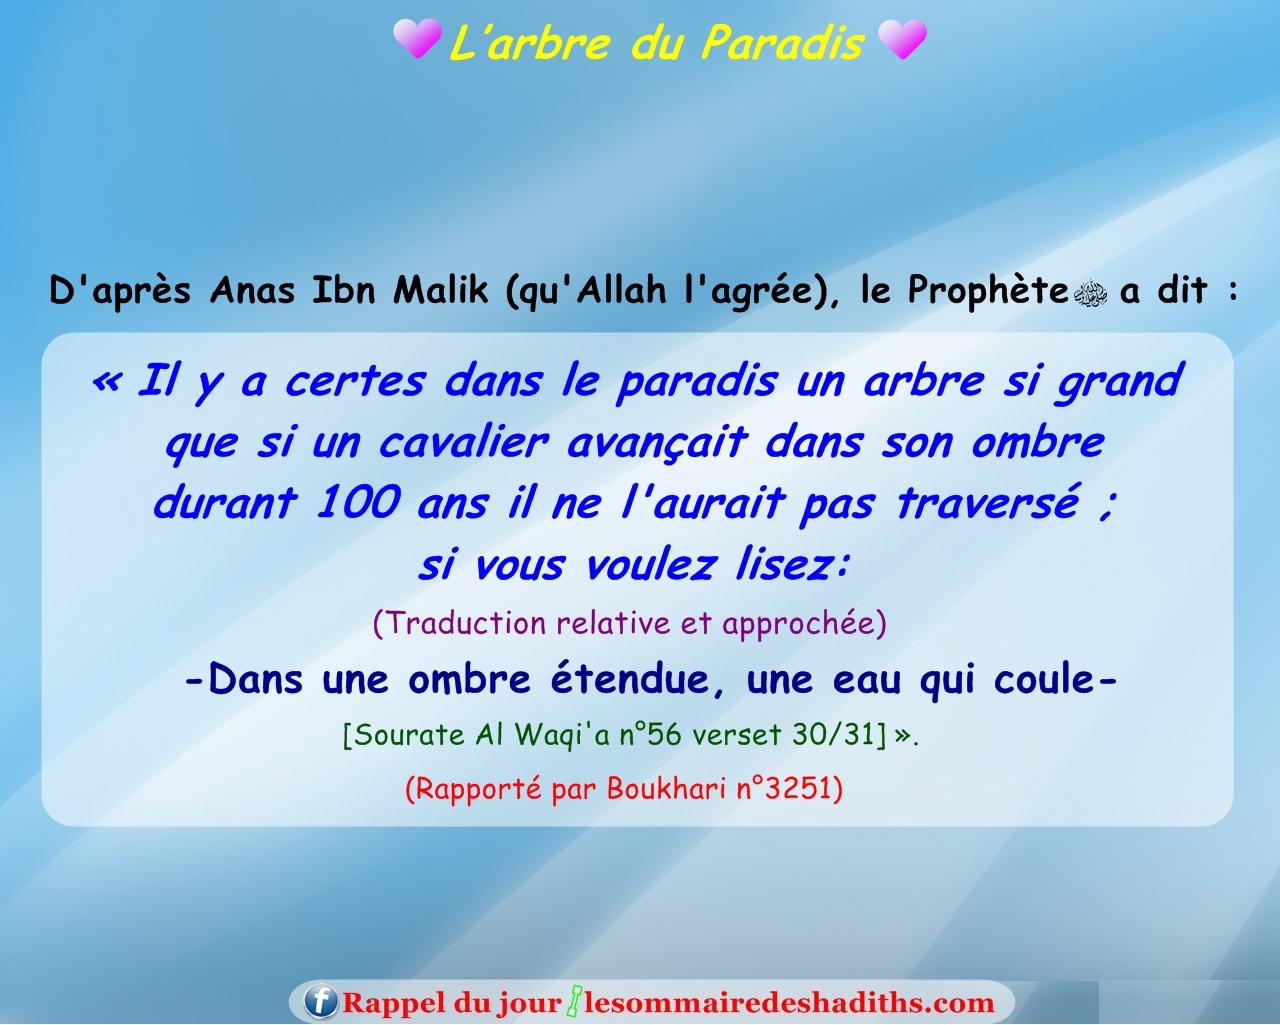 hadith L'arbre du Paradis (Anas Ibn Malik)